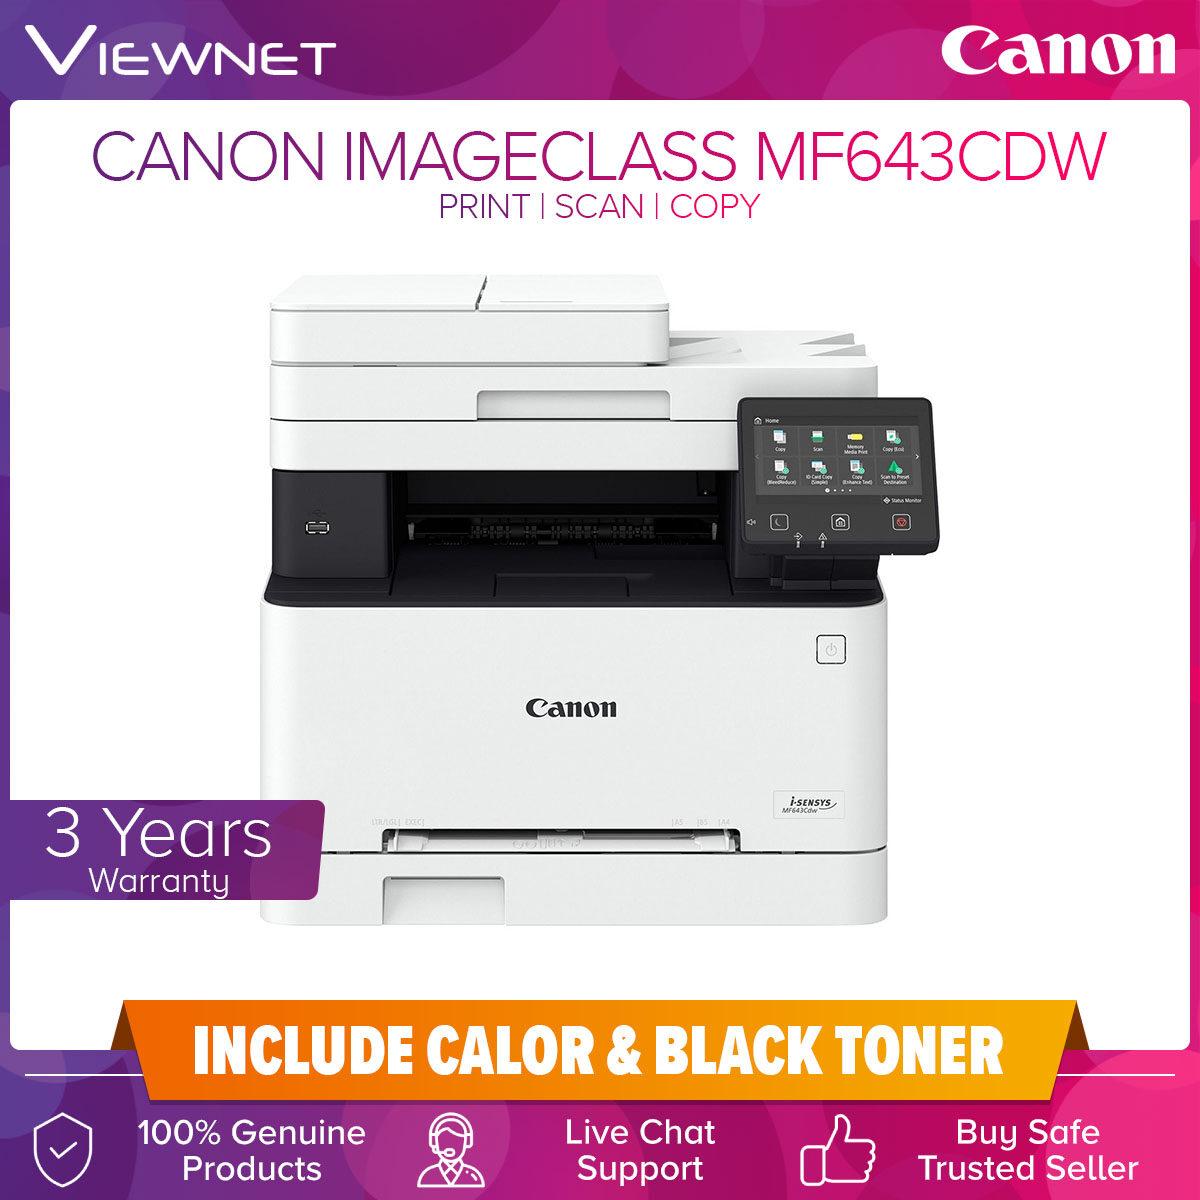 Canon imageCLASS MF643Cdw (Print Scan Copy) Laser Color Printer